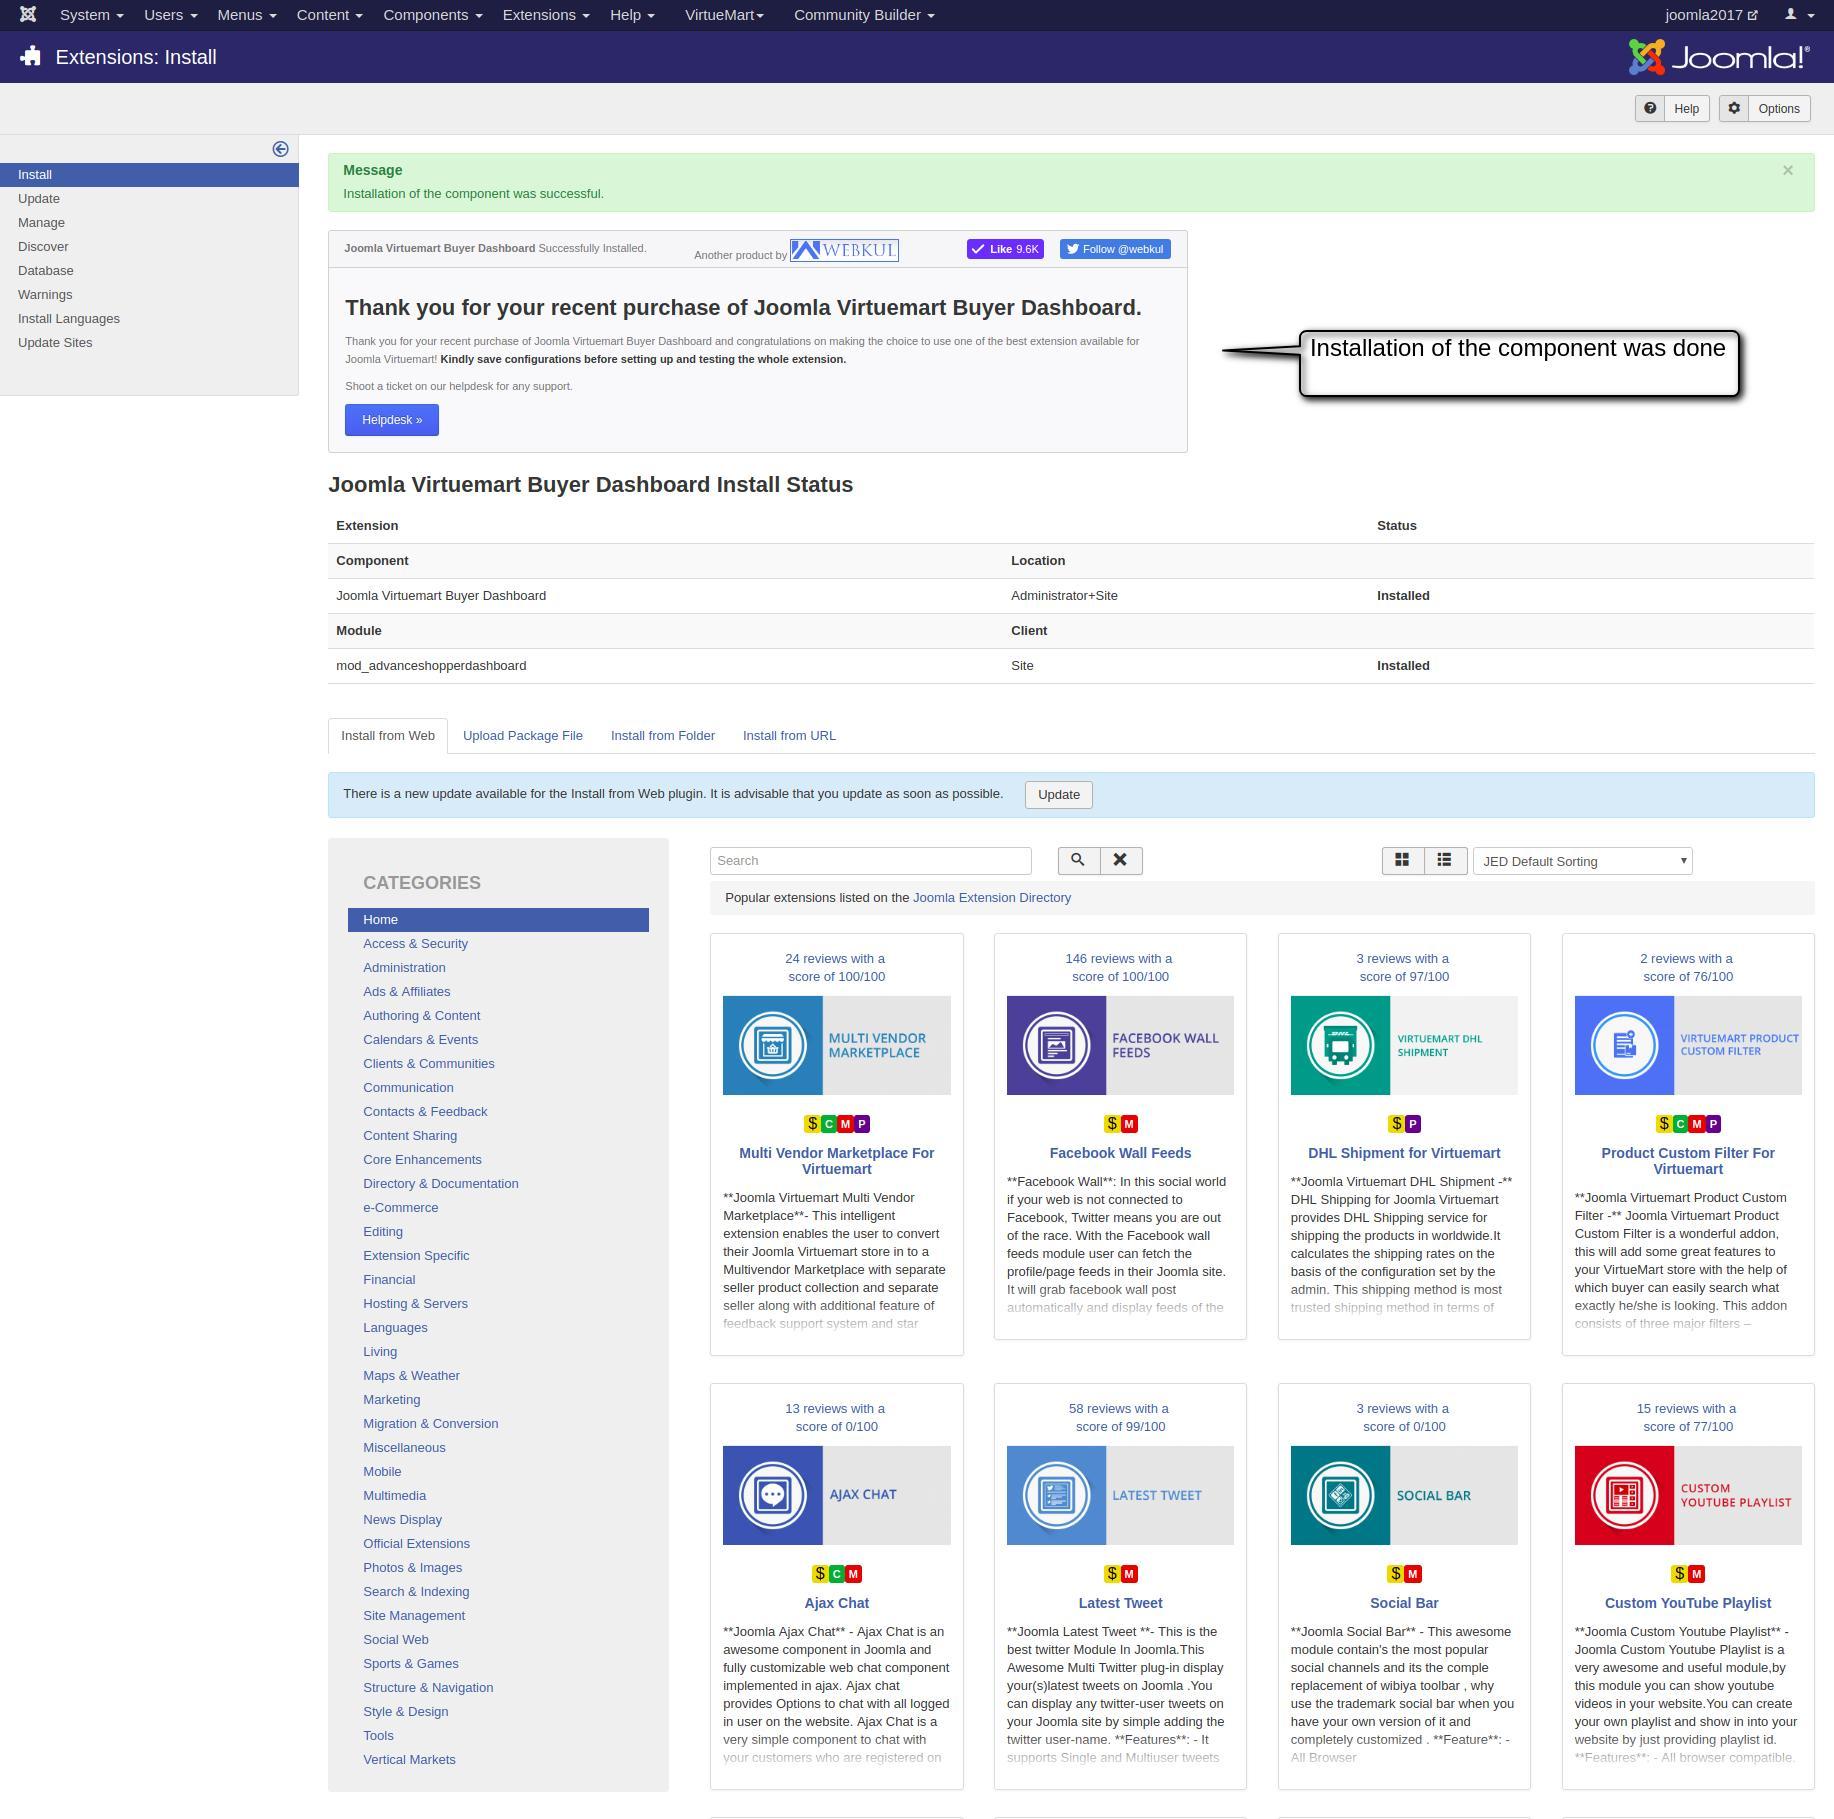 Joomla Virtuemart Buyer Dashboard For viewing Order, Reviews